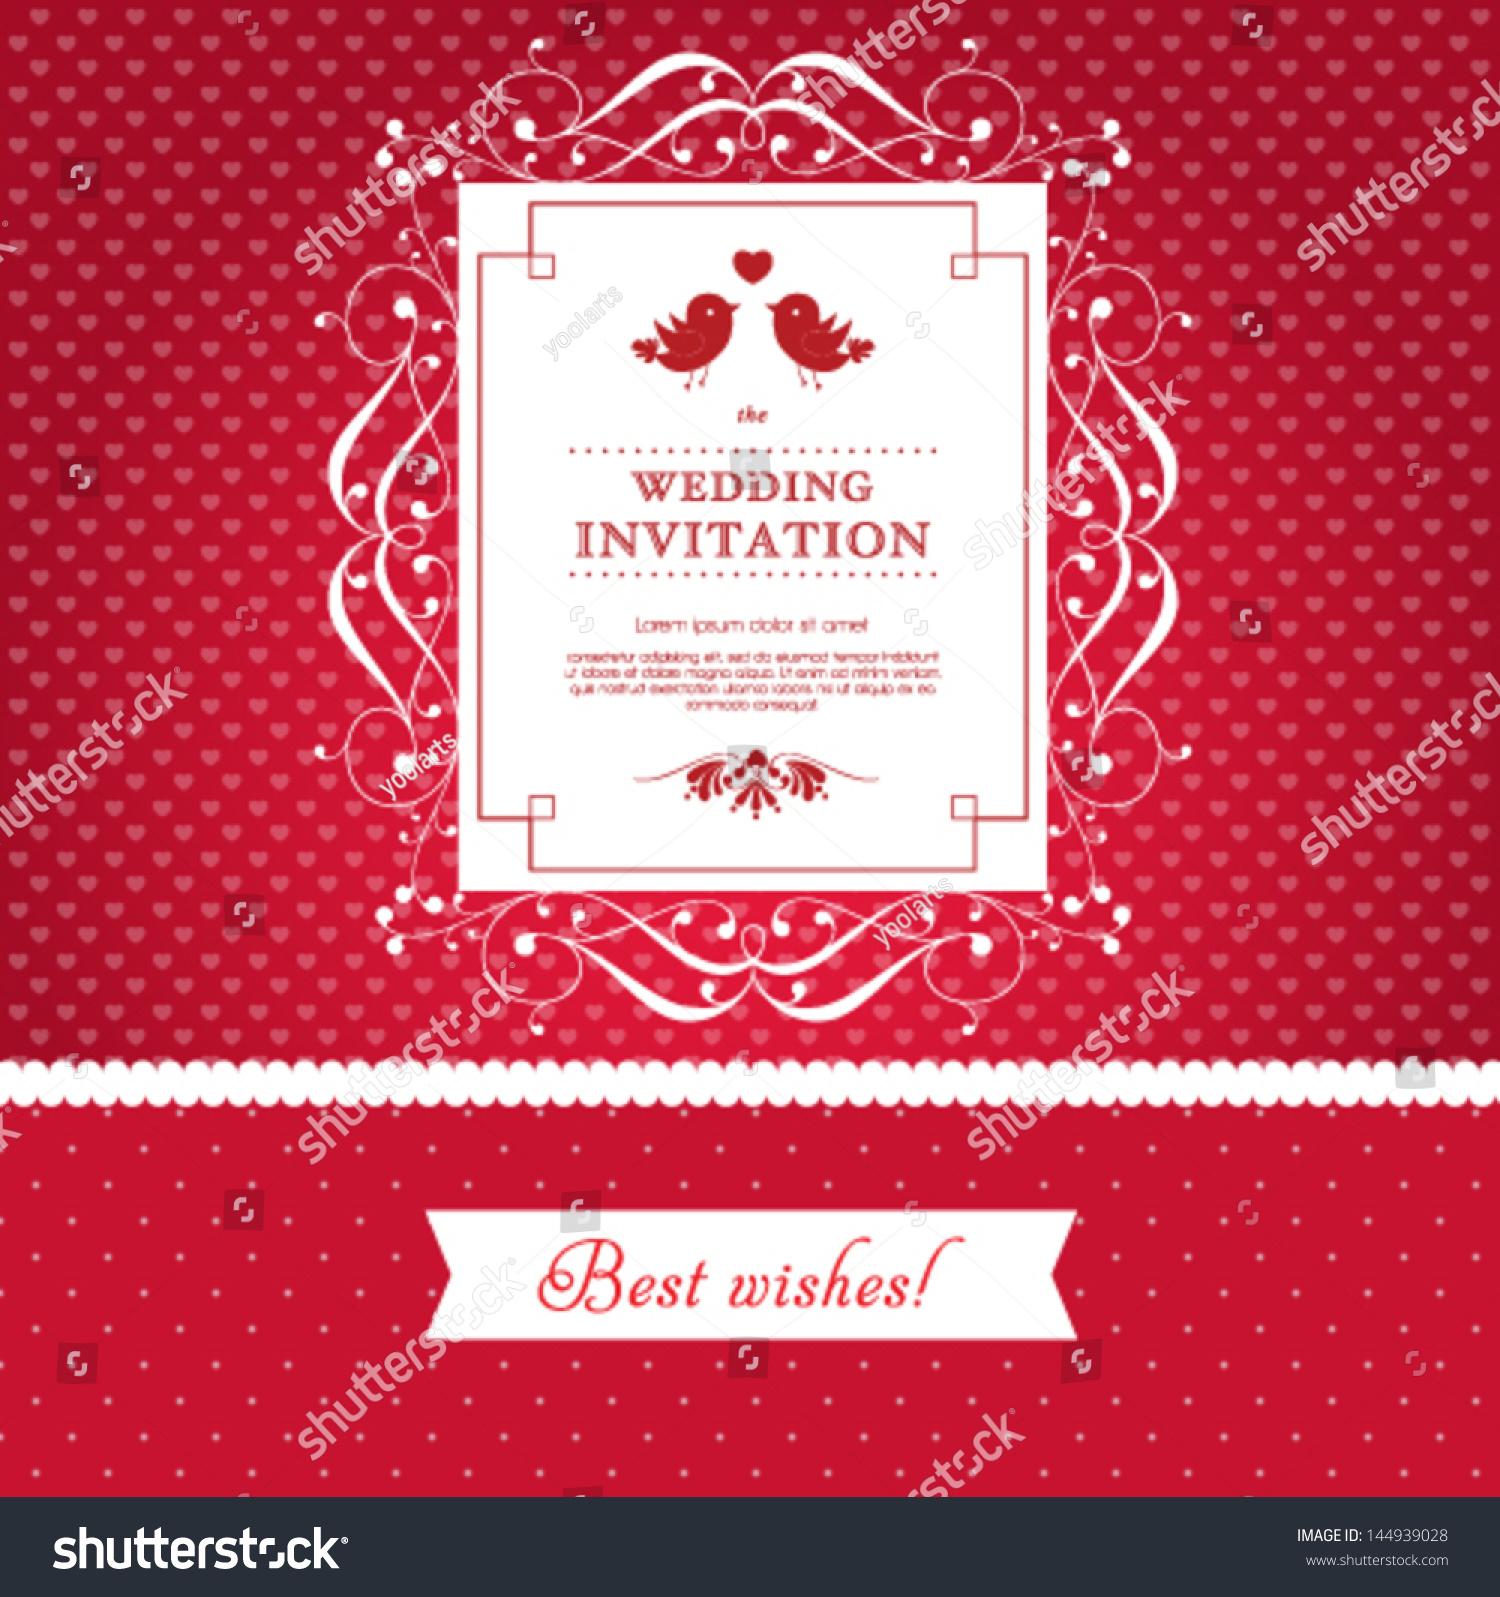 Vector Wedding Card Invitation Floral Ornament Stock Vector ...